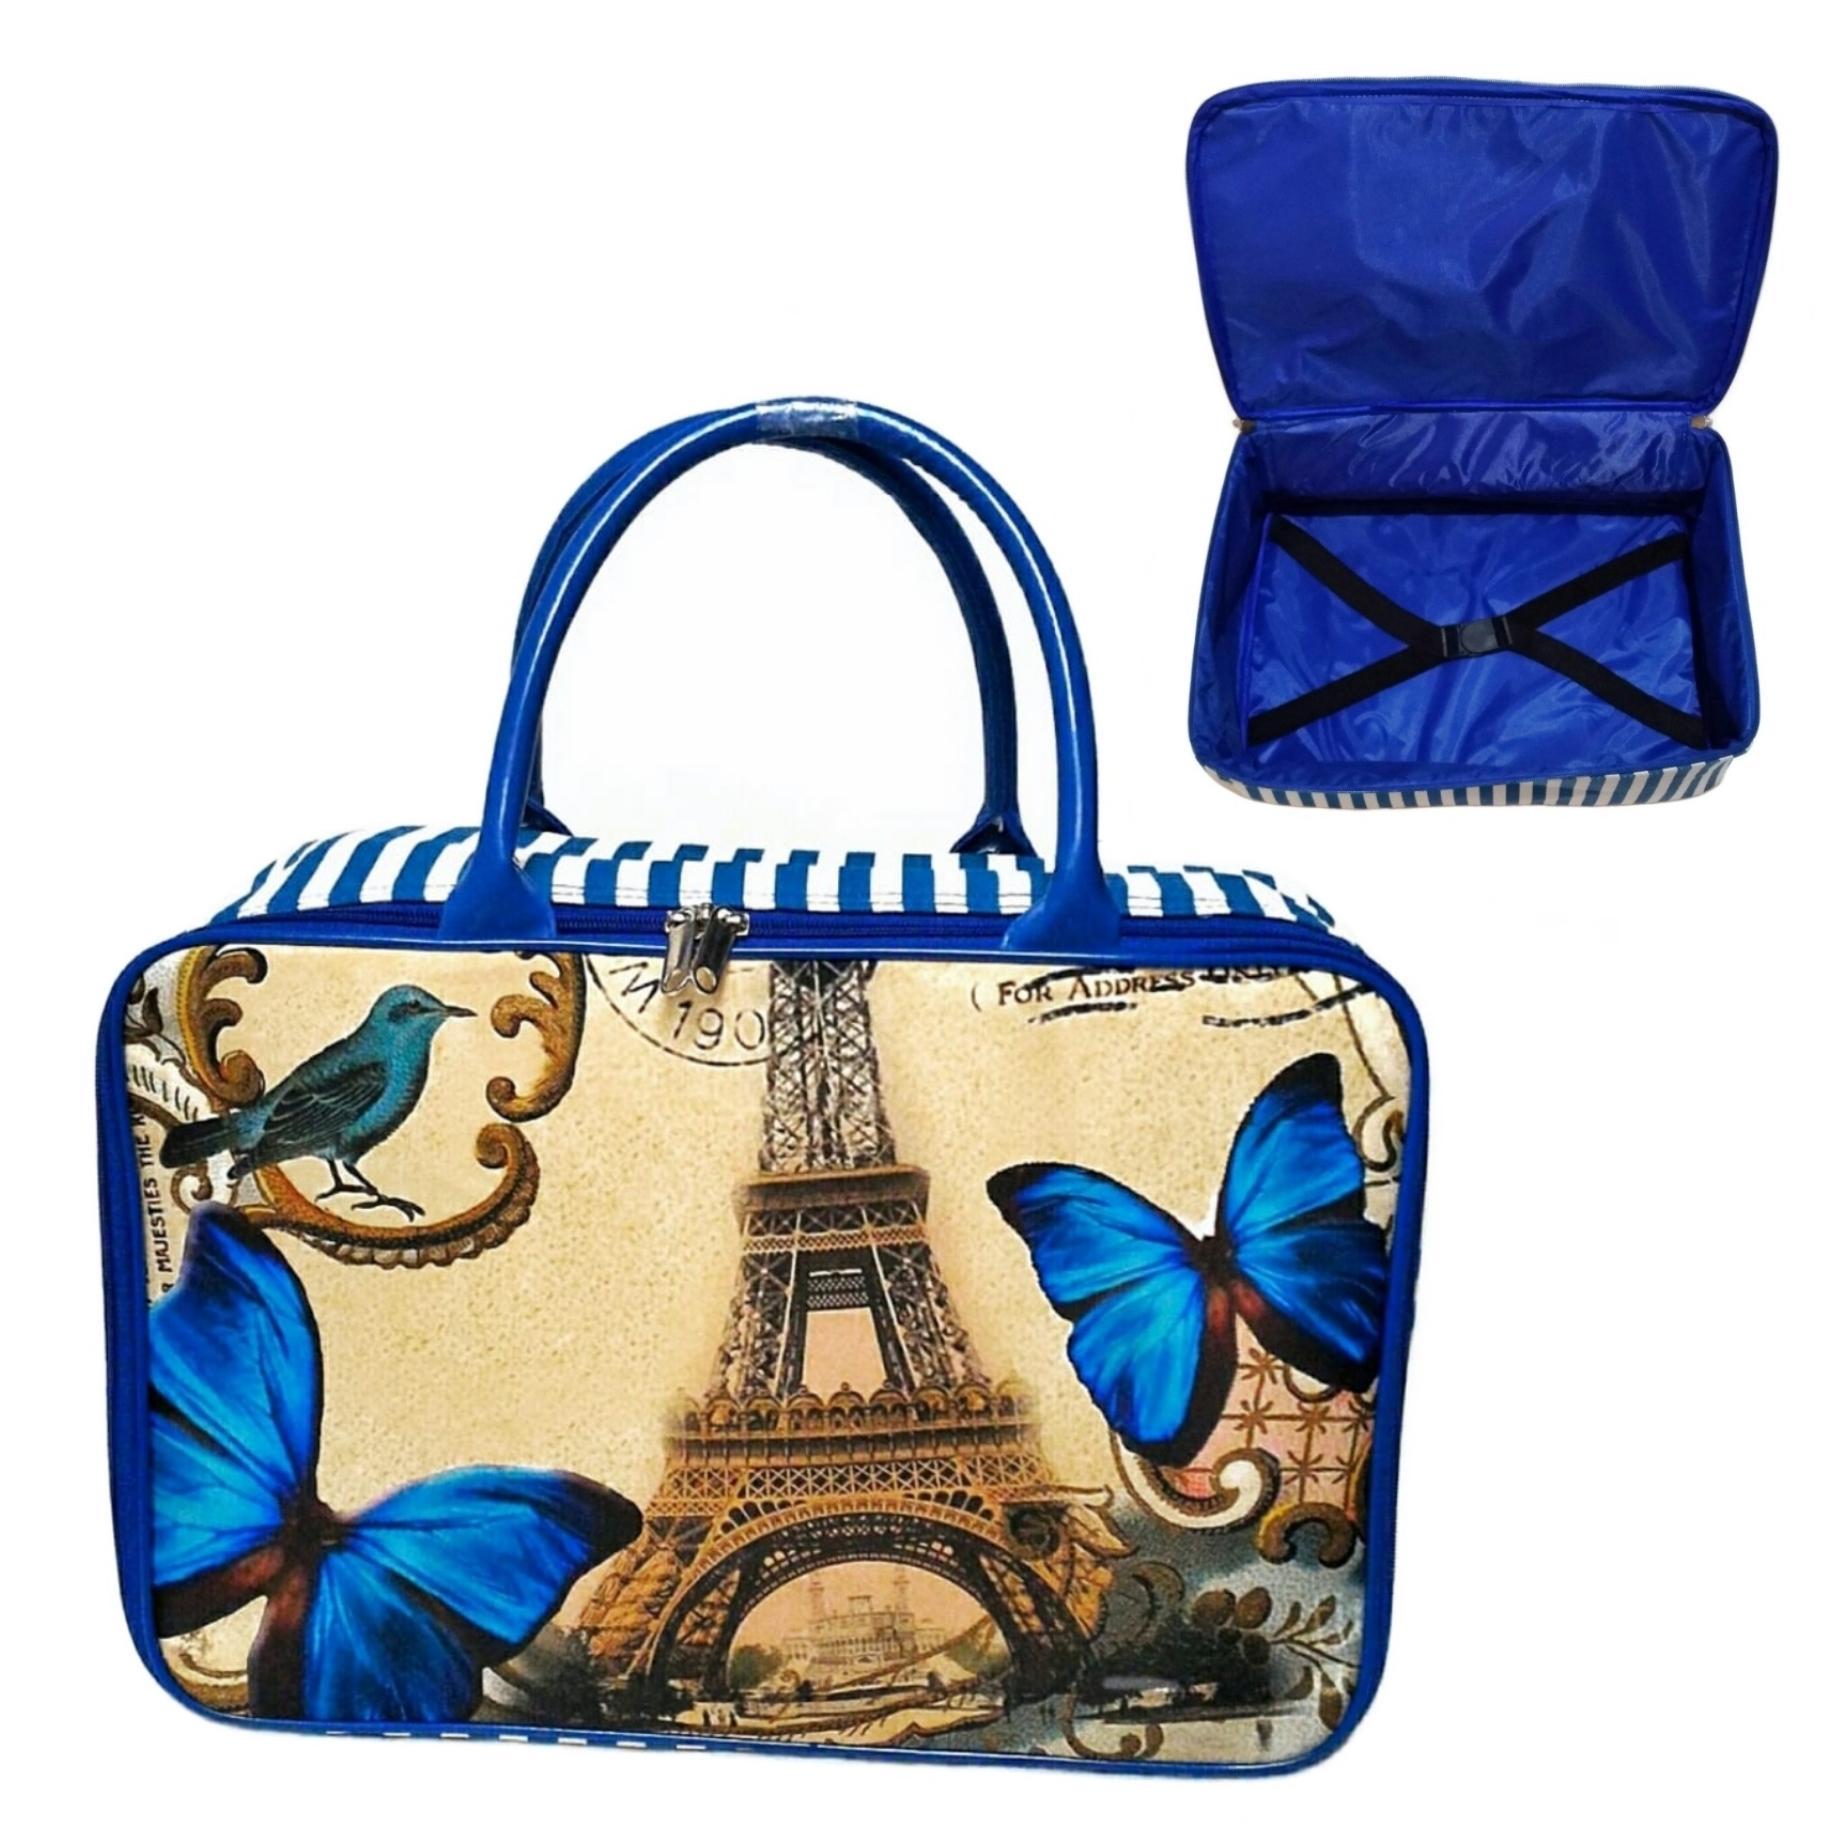 AMT Travel Bag Kanvas Paris Kupu Biru Jumbo dengan Karet Pengikat Baju